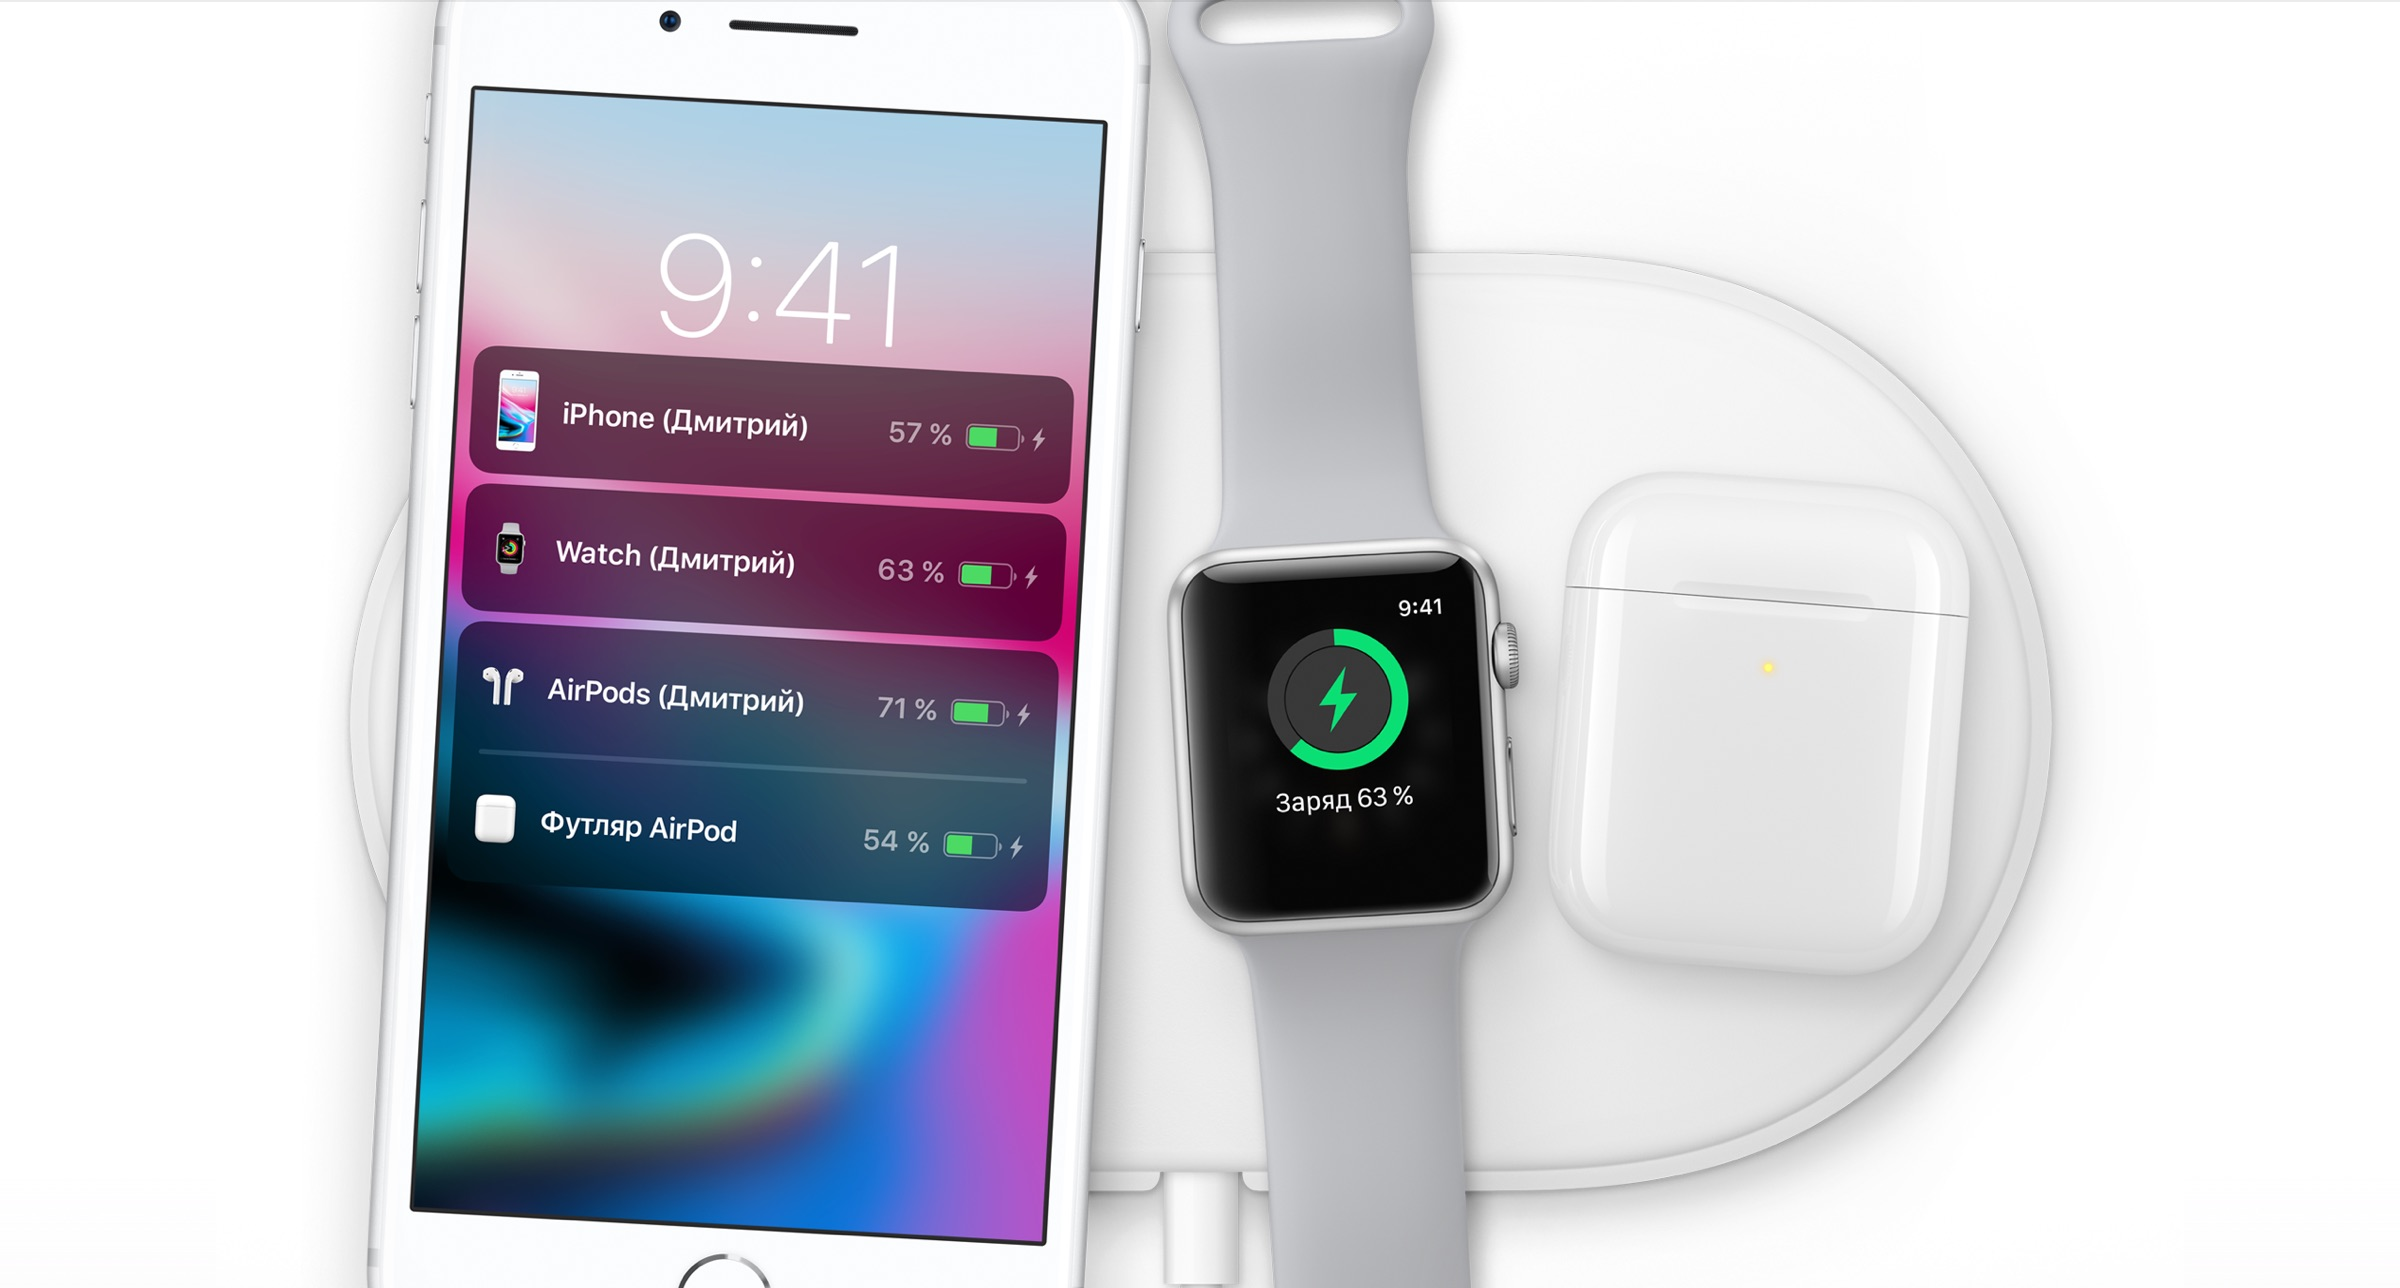 Apple анонсировала AirPower – беспроводную зарядку для iPhone Х, 8/8 Plus, Apple Watch и AirPods